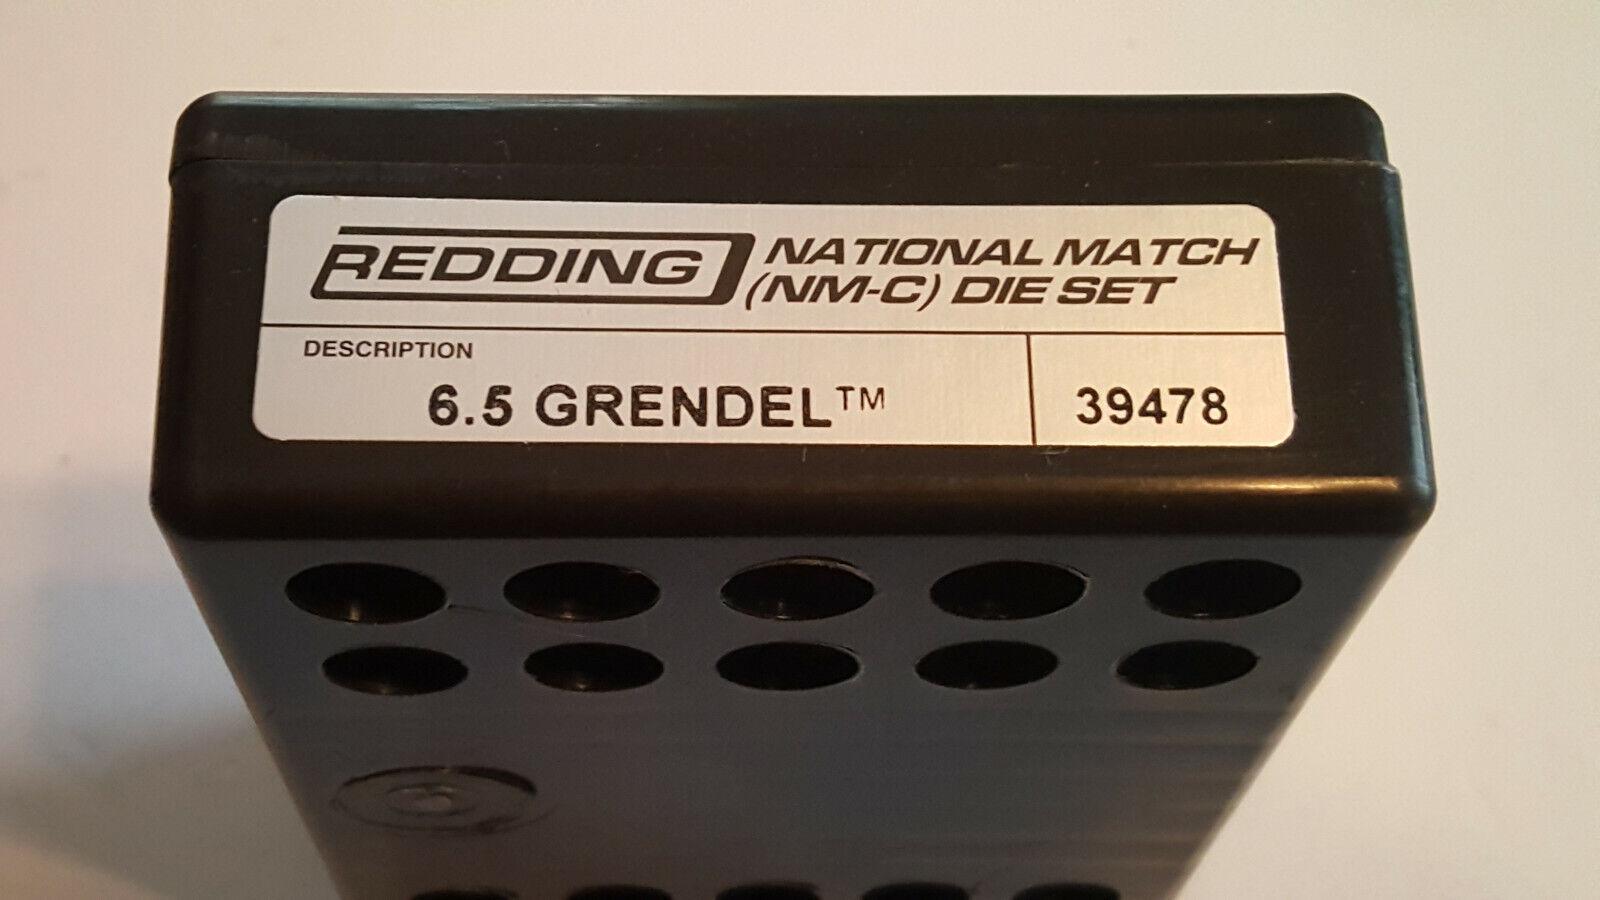 39478 rojoDING 6.5 Grendel partido Die Set-NATIONAL Nuevo-Envío Gratis